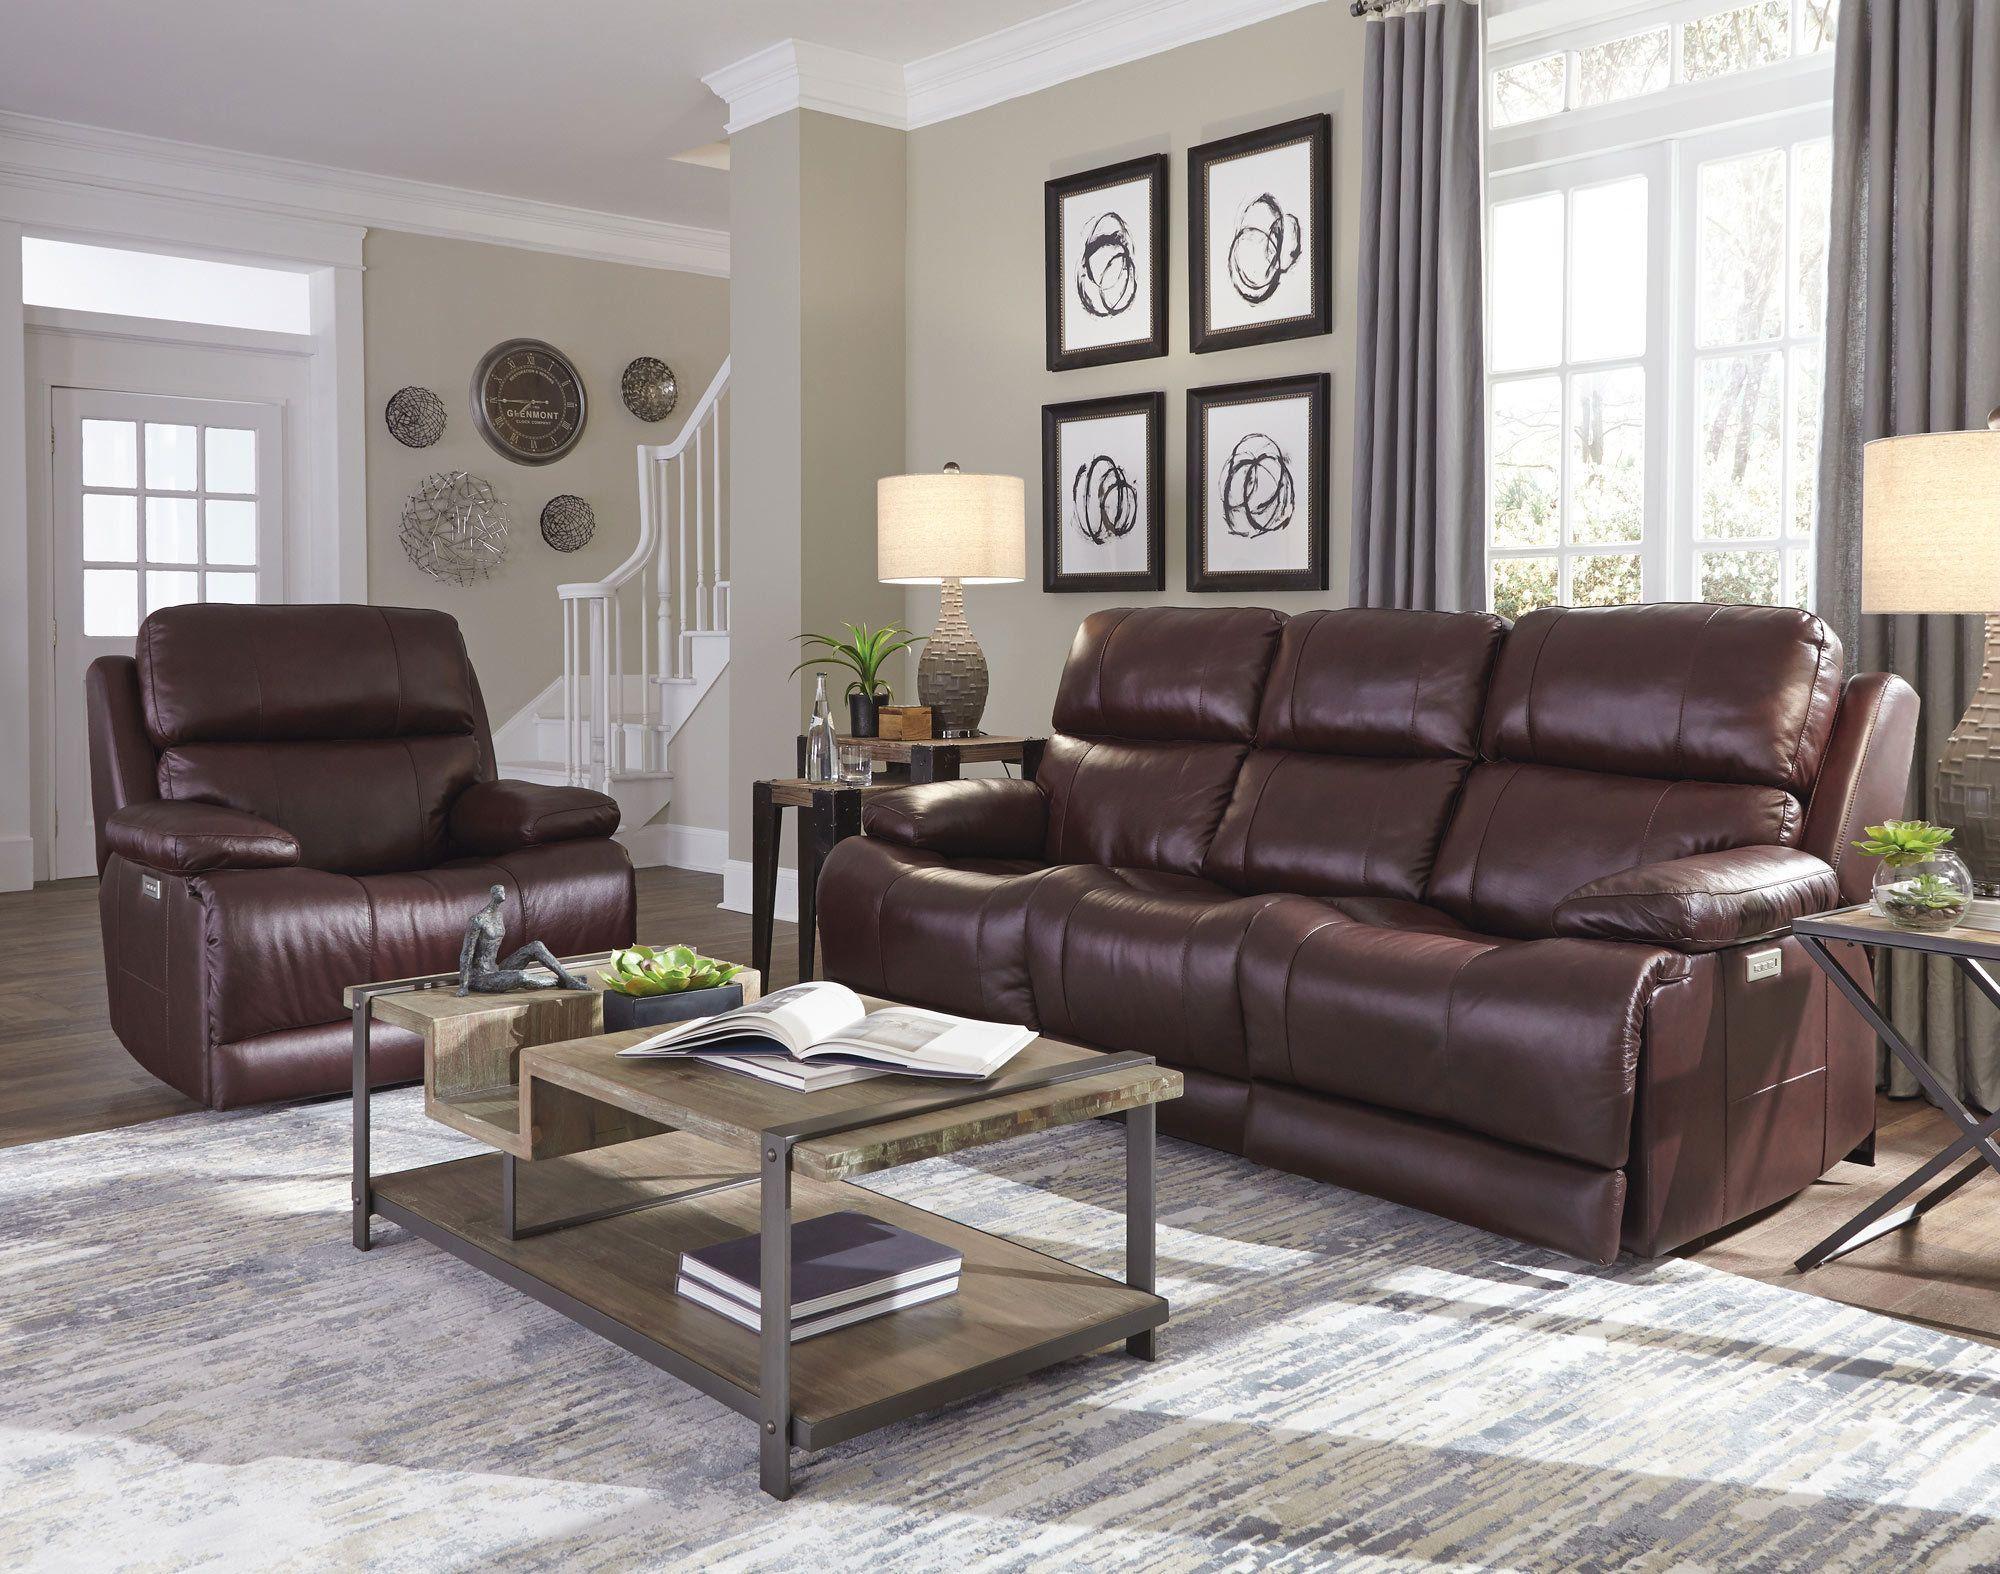 Kenaston Power Reclining Sofa With Headrest And Lumbar Palliser Furniture Home G Minimalist Living Room Brown Couch Living Room Living Room Decor Apartment